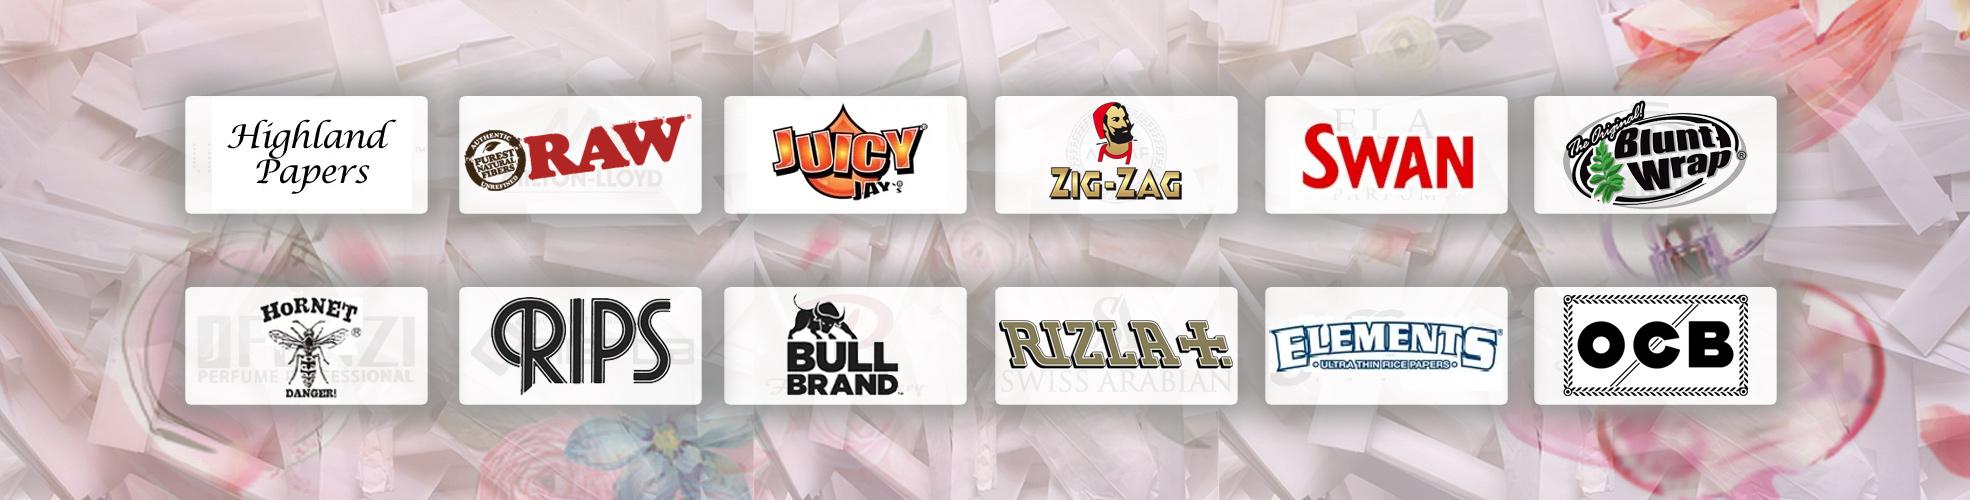 Wholesale Smoking, Rolling Papers, Raw, Rizla, Zig-Zag